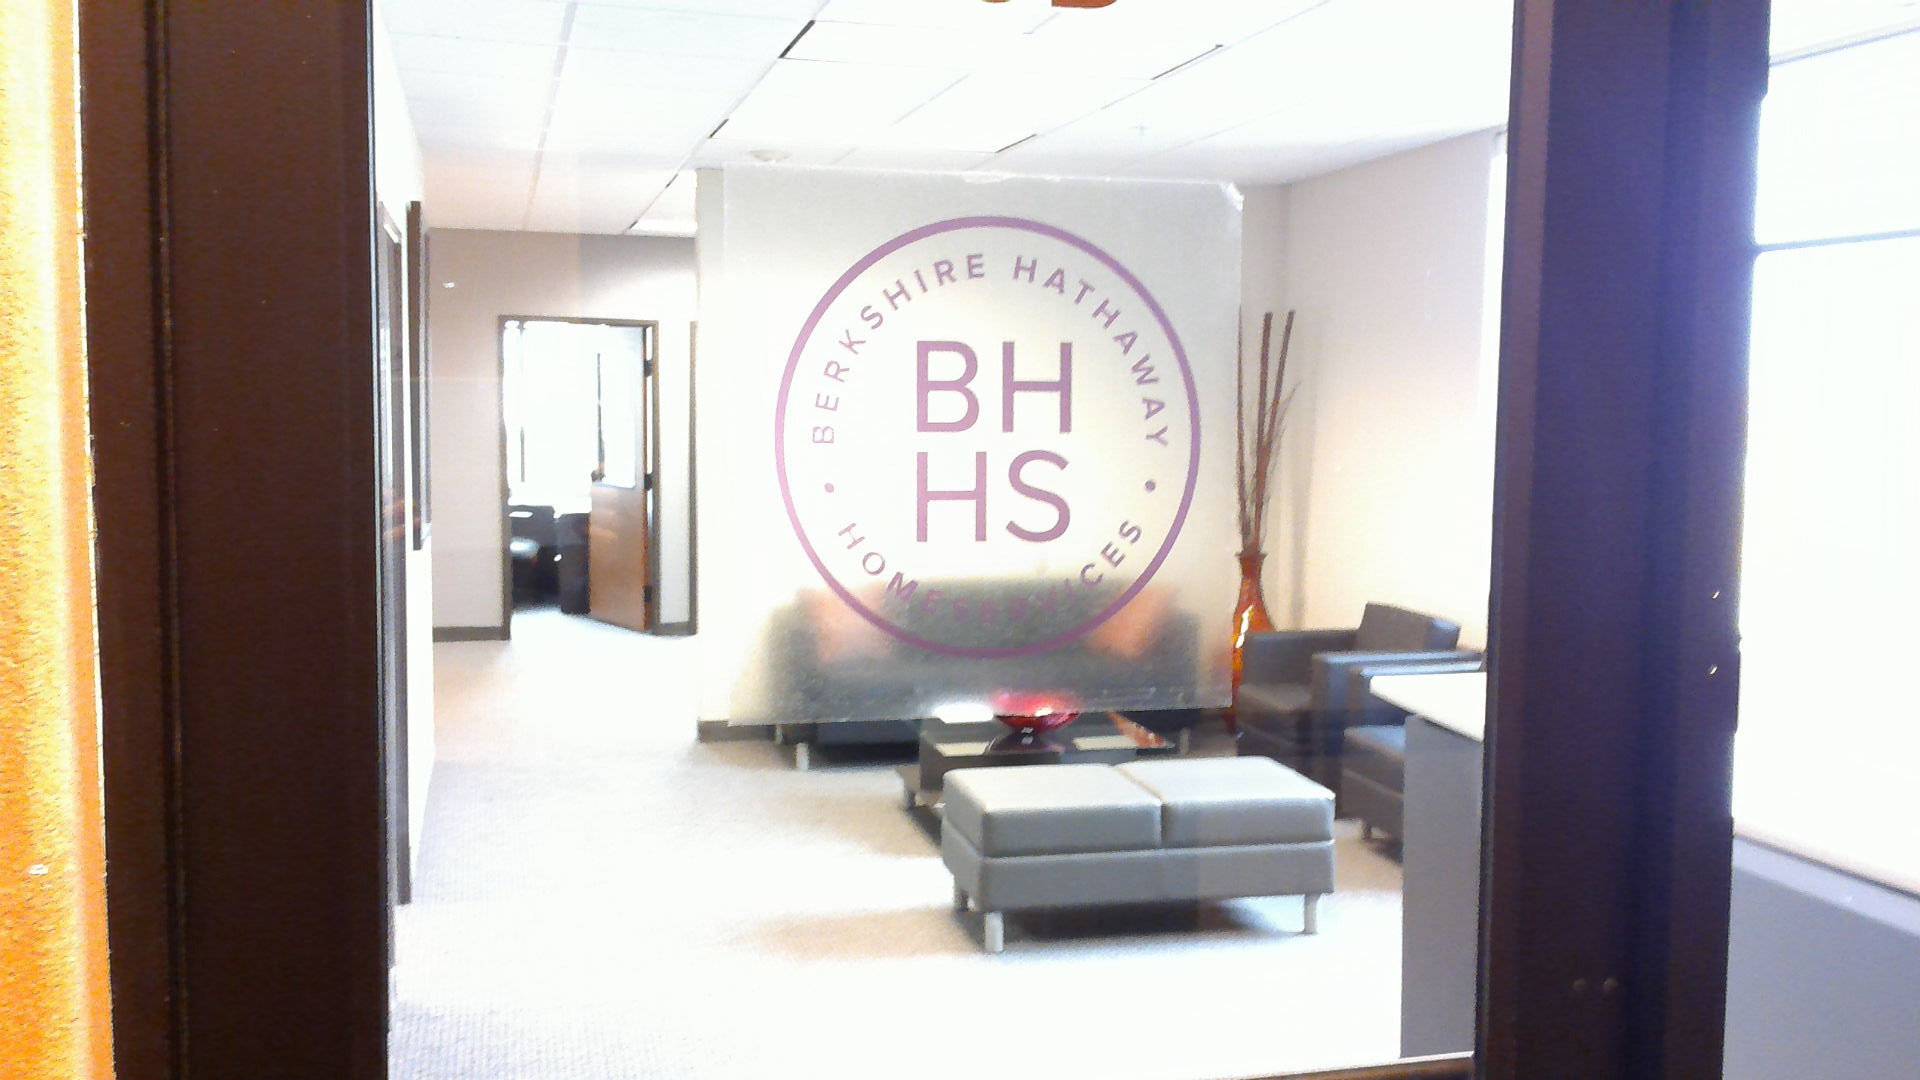 Berkshire Hathaway HomeServices Central Washington Real Estate Tri-Cities | 299 Bradley Blvd Ste 102, Richland, WA, 99352 | +1 (509) 563-5117